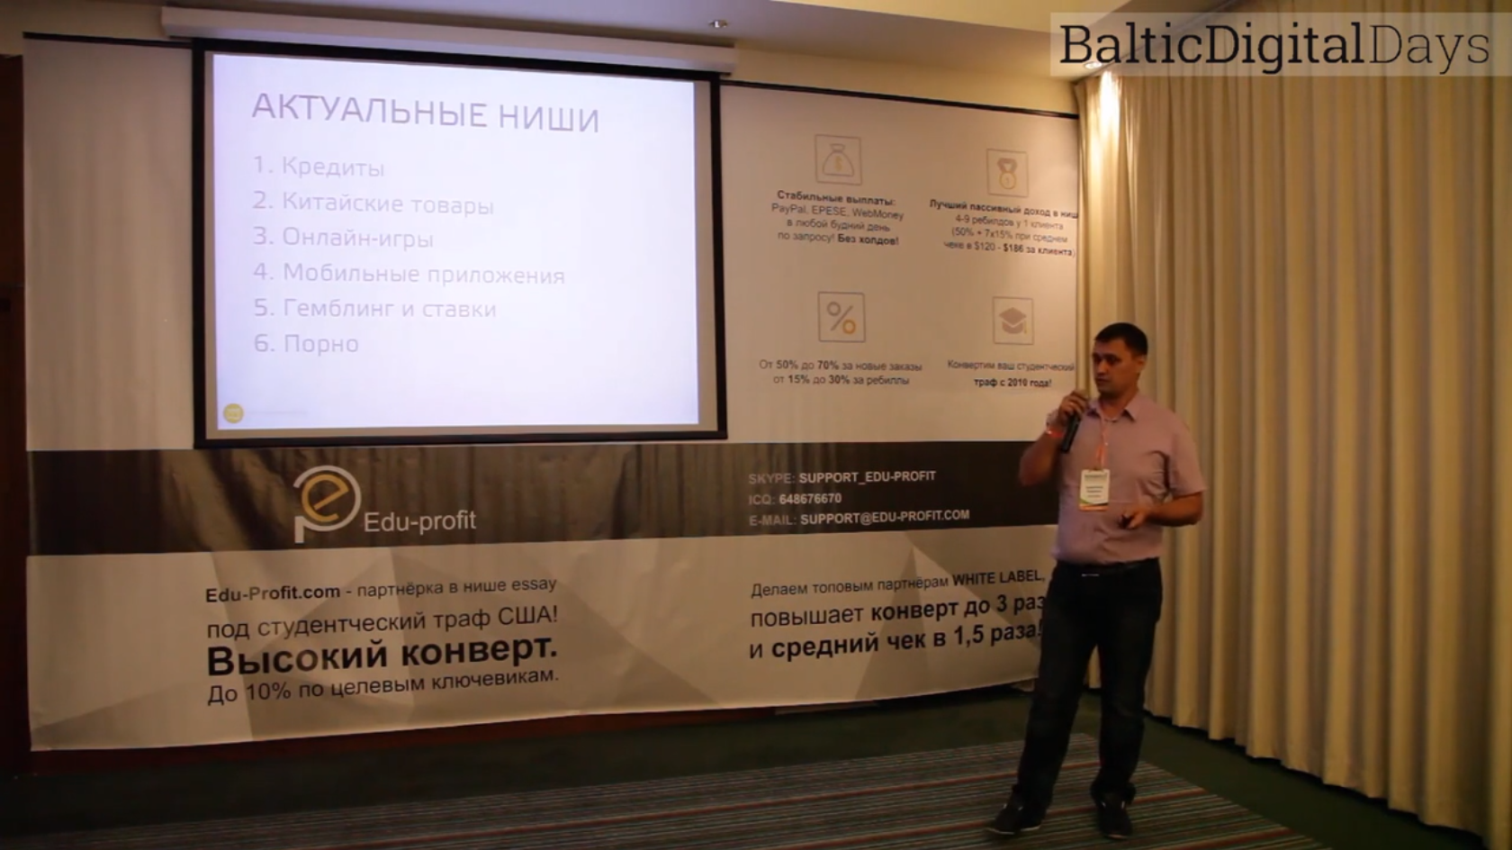 Отзыв SEO-аспиранта на доклады с Baltic Digital Days 2015